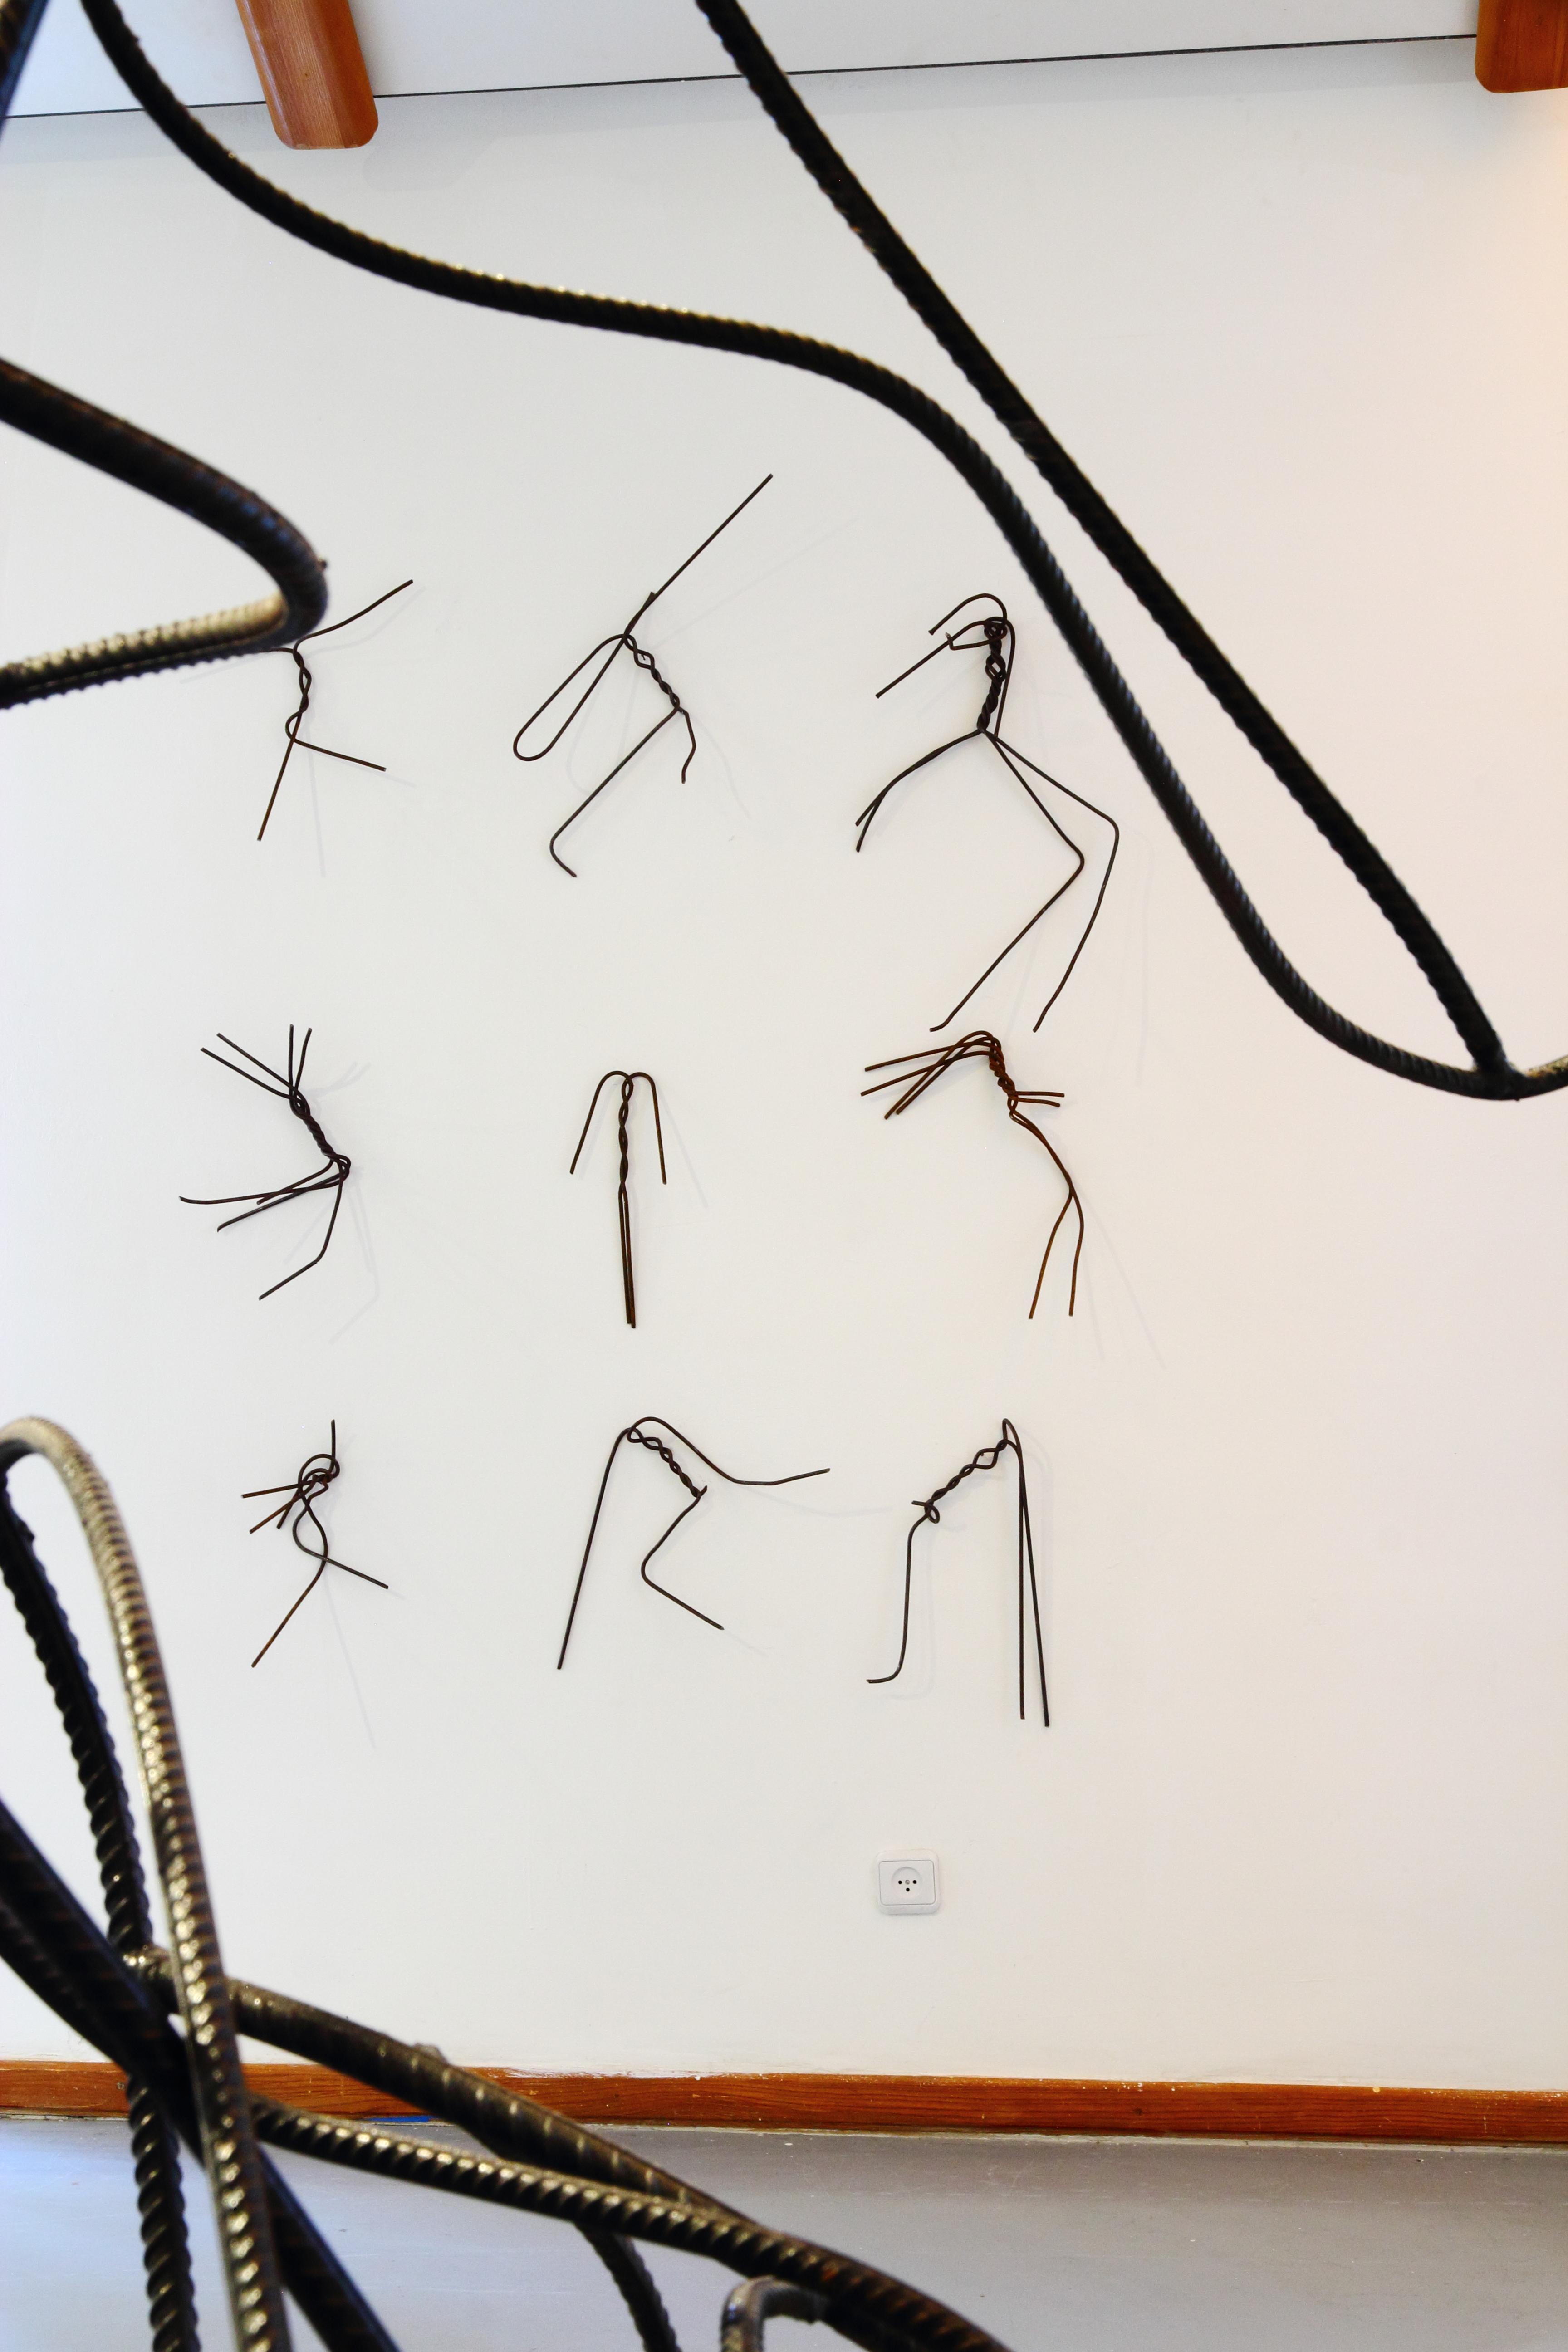 knots - Art by Arik Afek